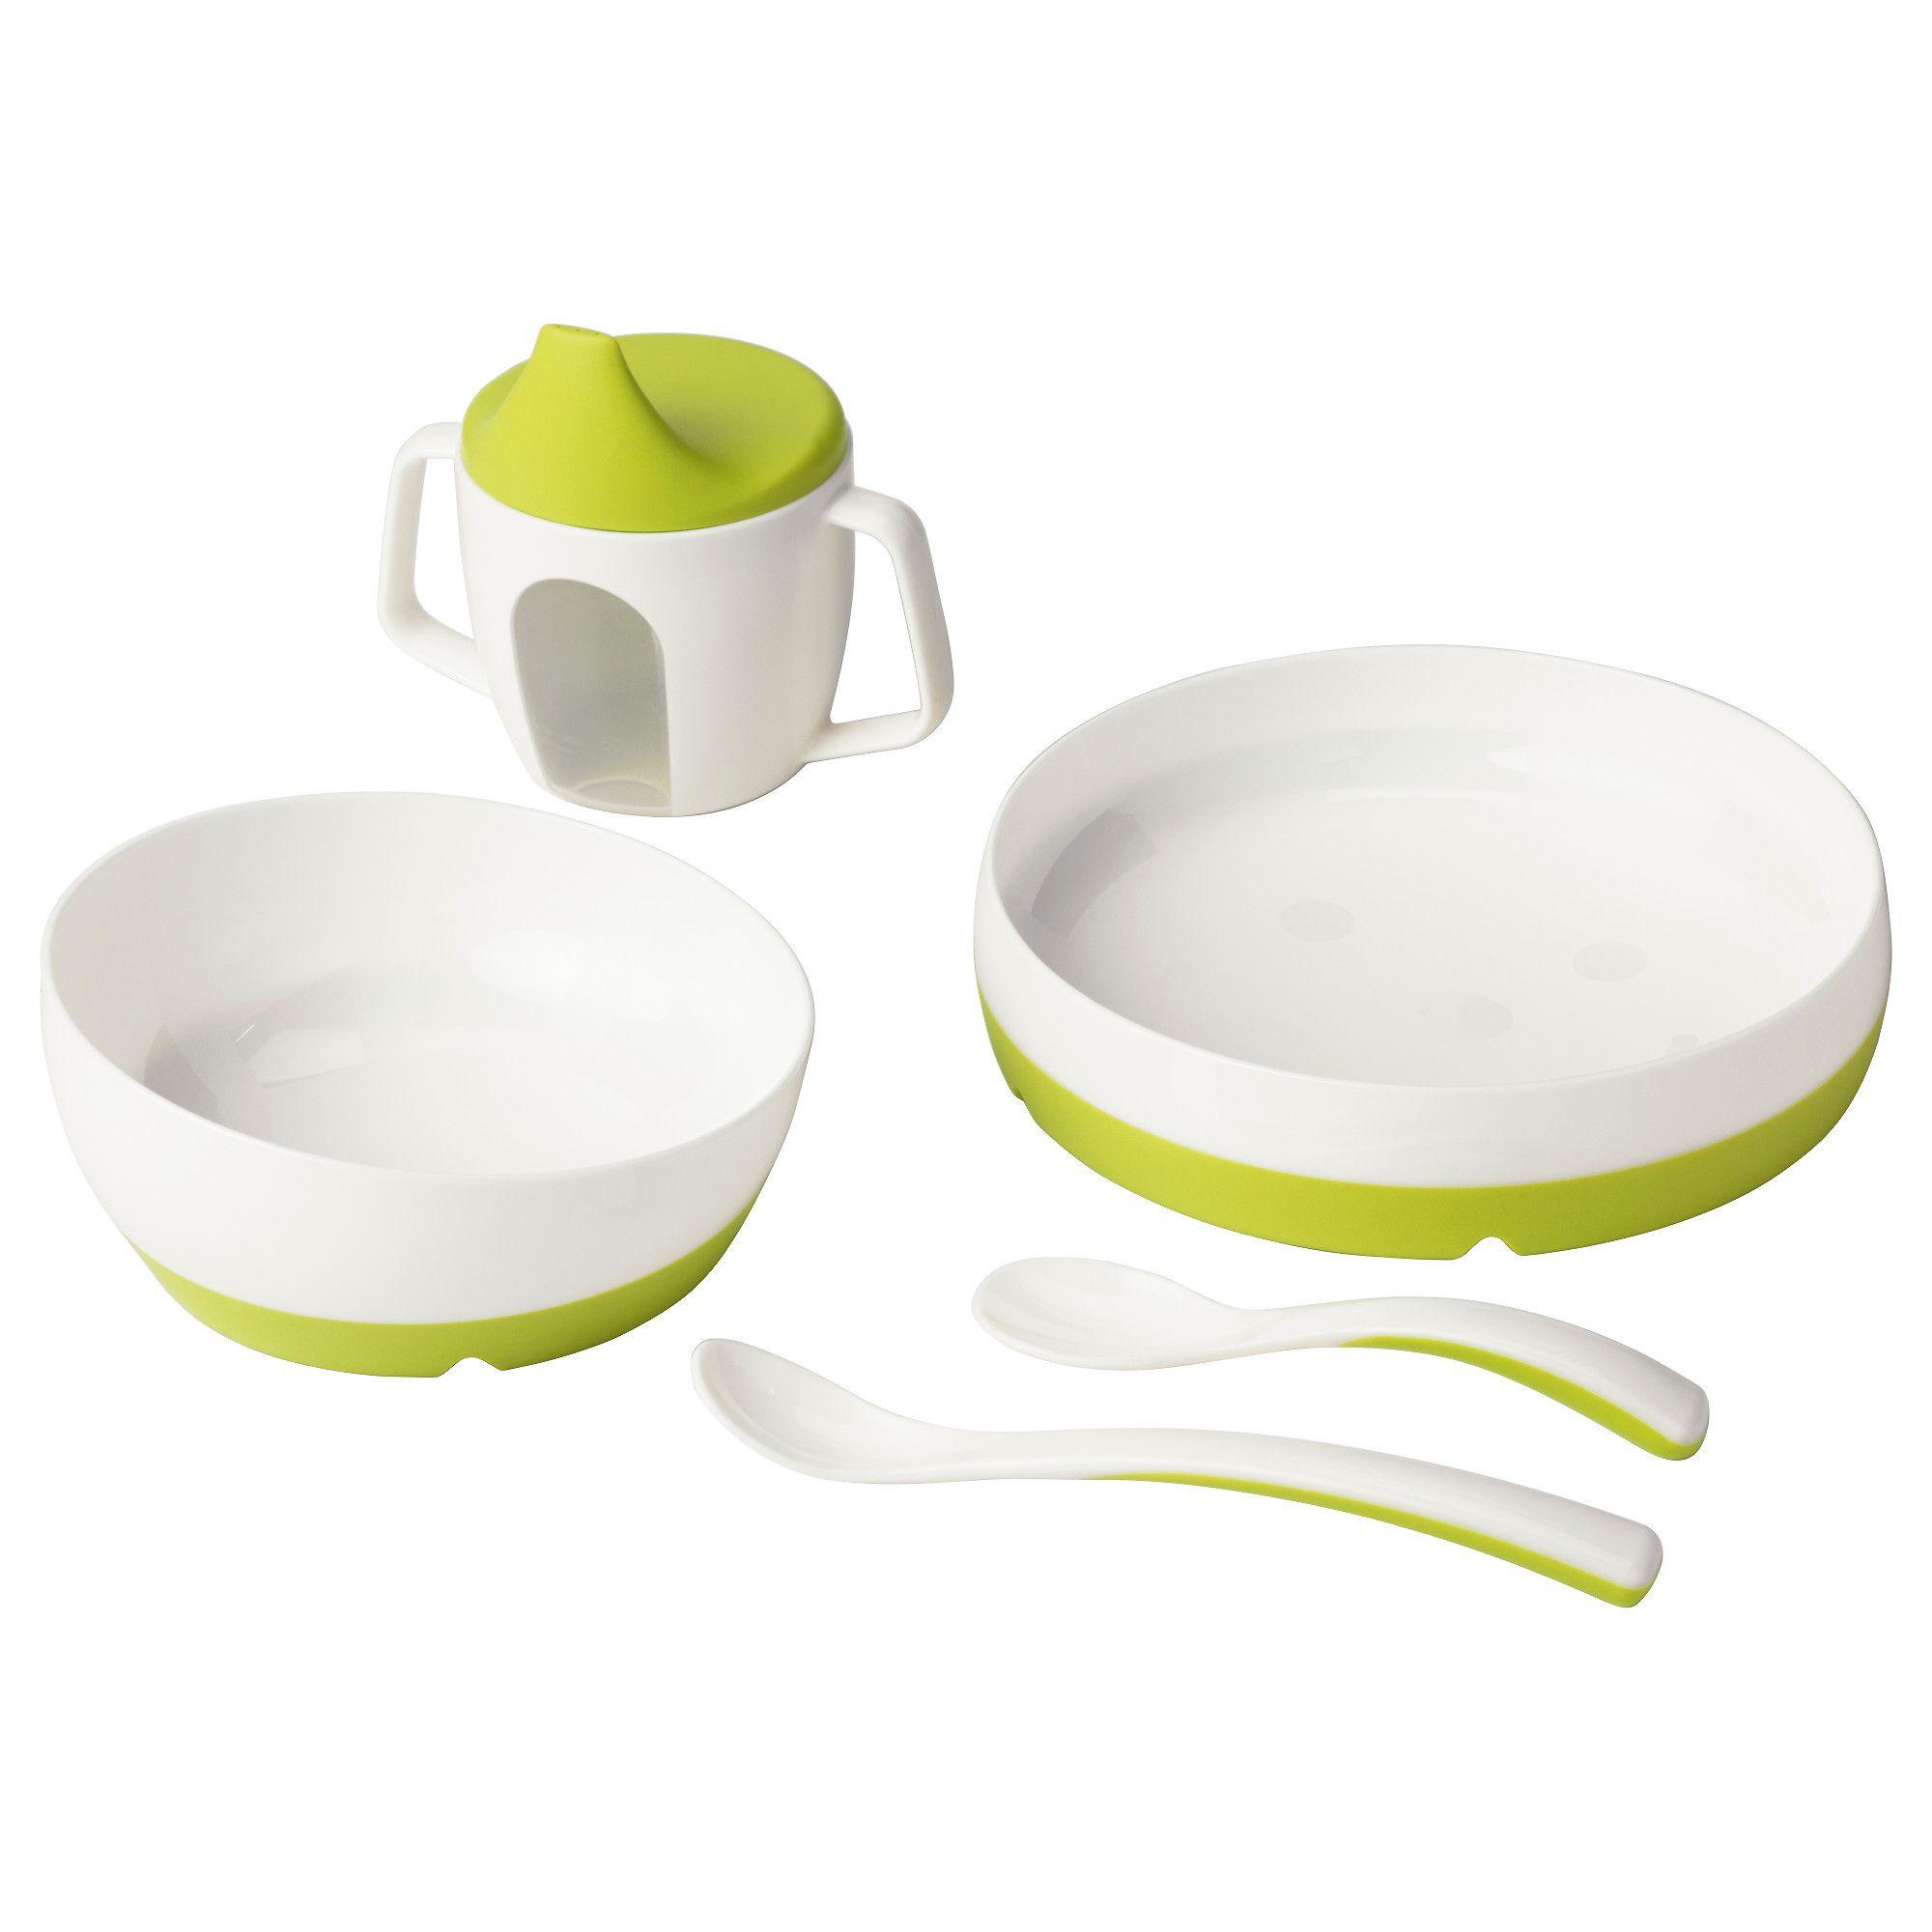 BORJA Feeding Spoon and Baby Spoon Plastic Cutlery Microwave Safe IKEA